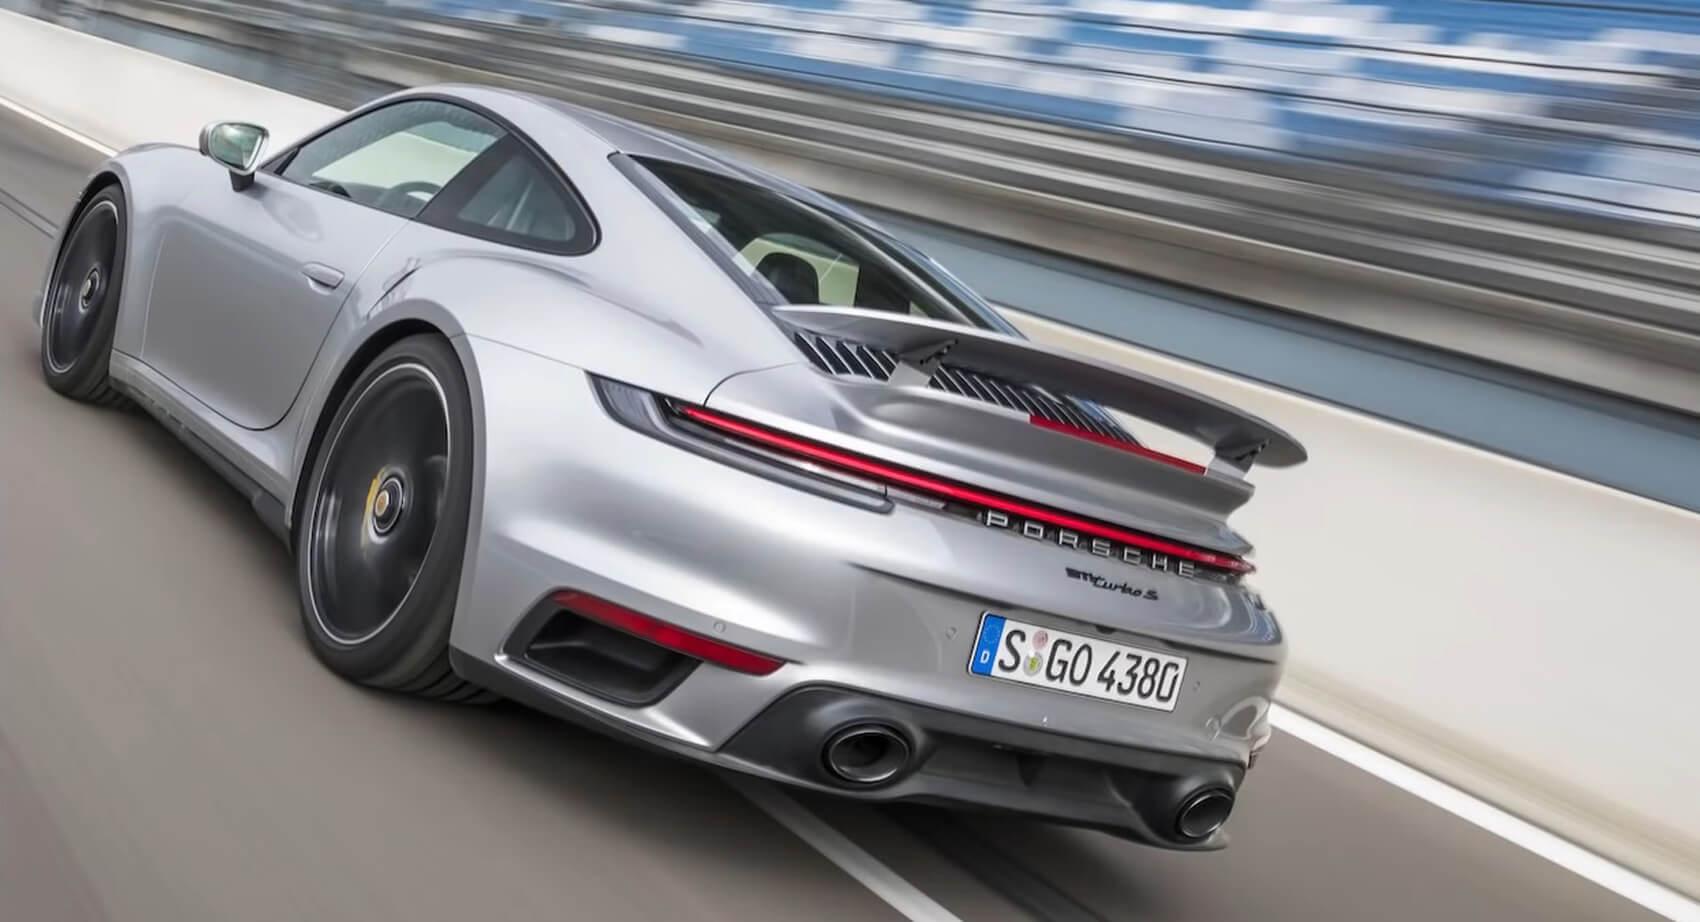 2021 Porsche 911 Turbo S Goes Around The Track Faster Than The Lambo Huracan Evo And Ferrari 488 Gtb Carscoops